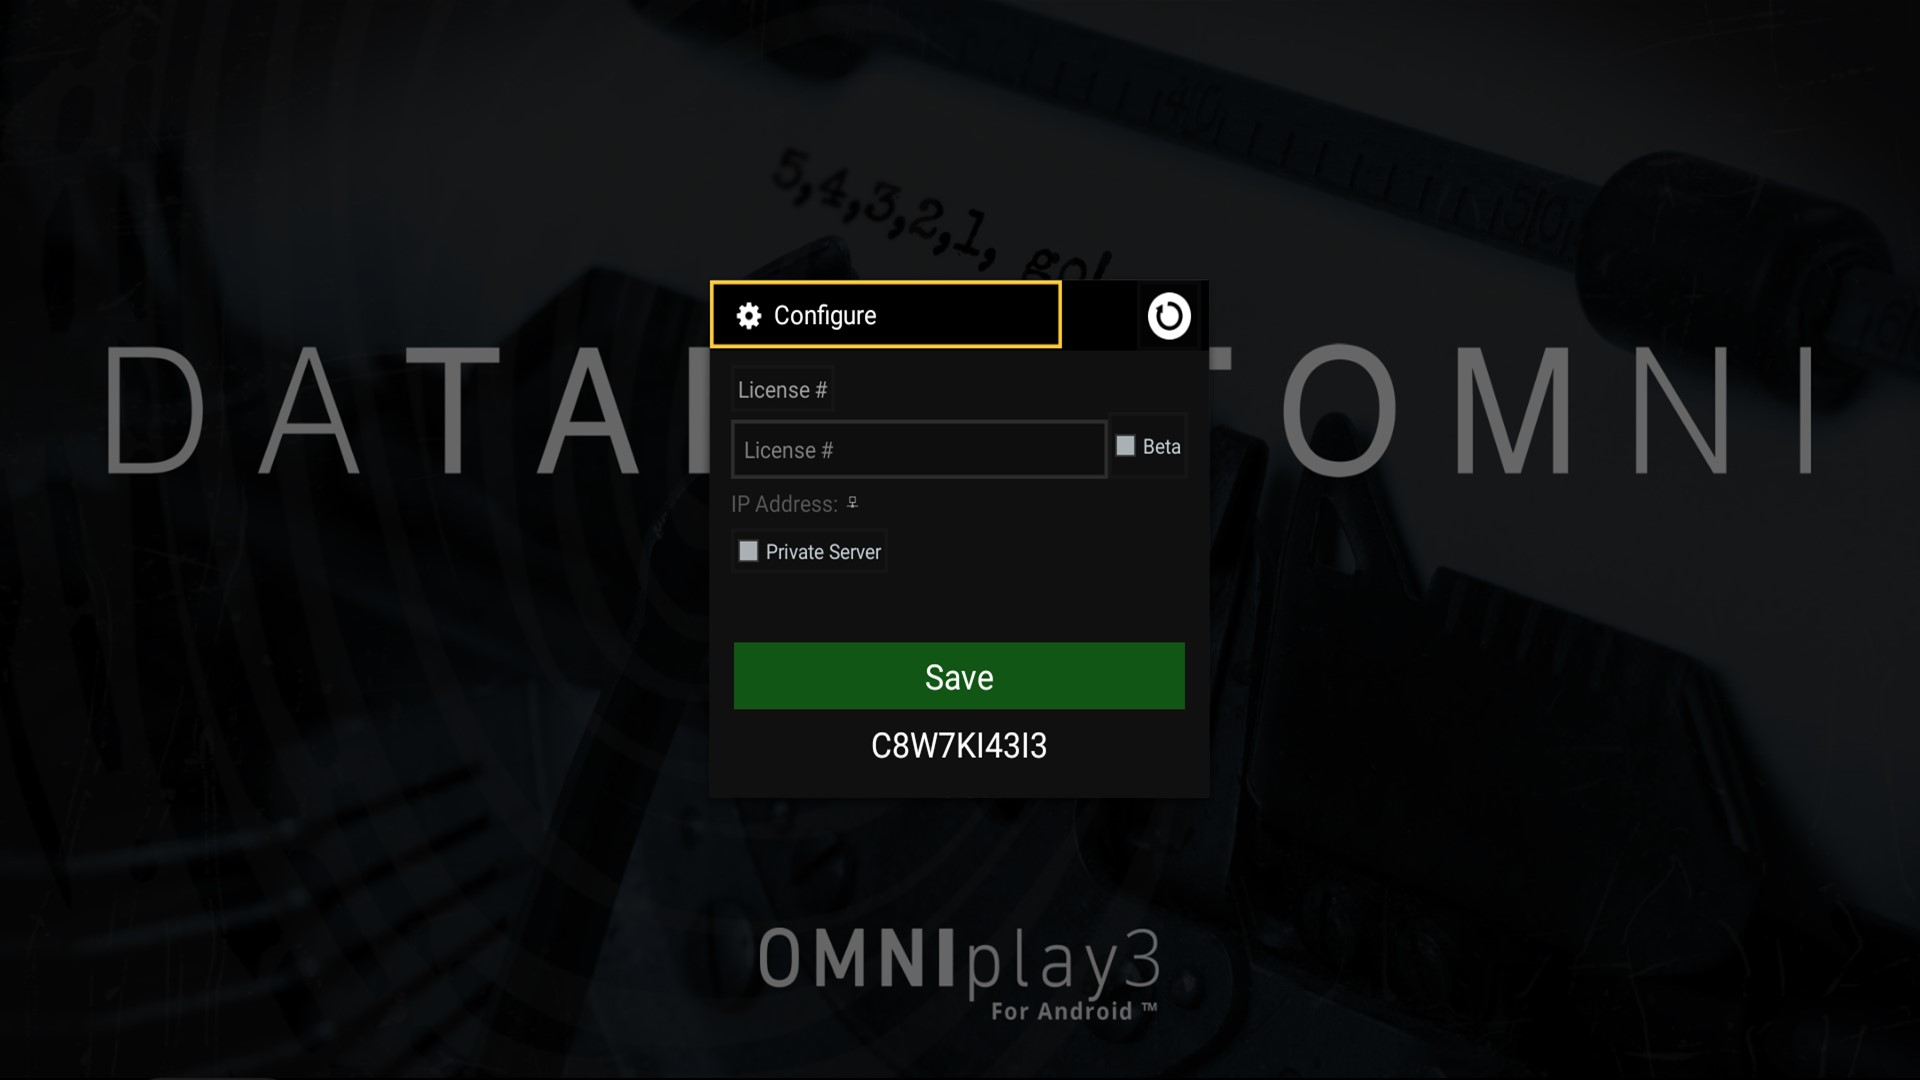 Databeat OMNIplay3 Configure